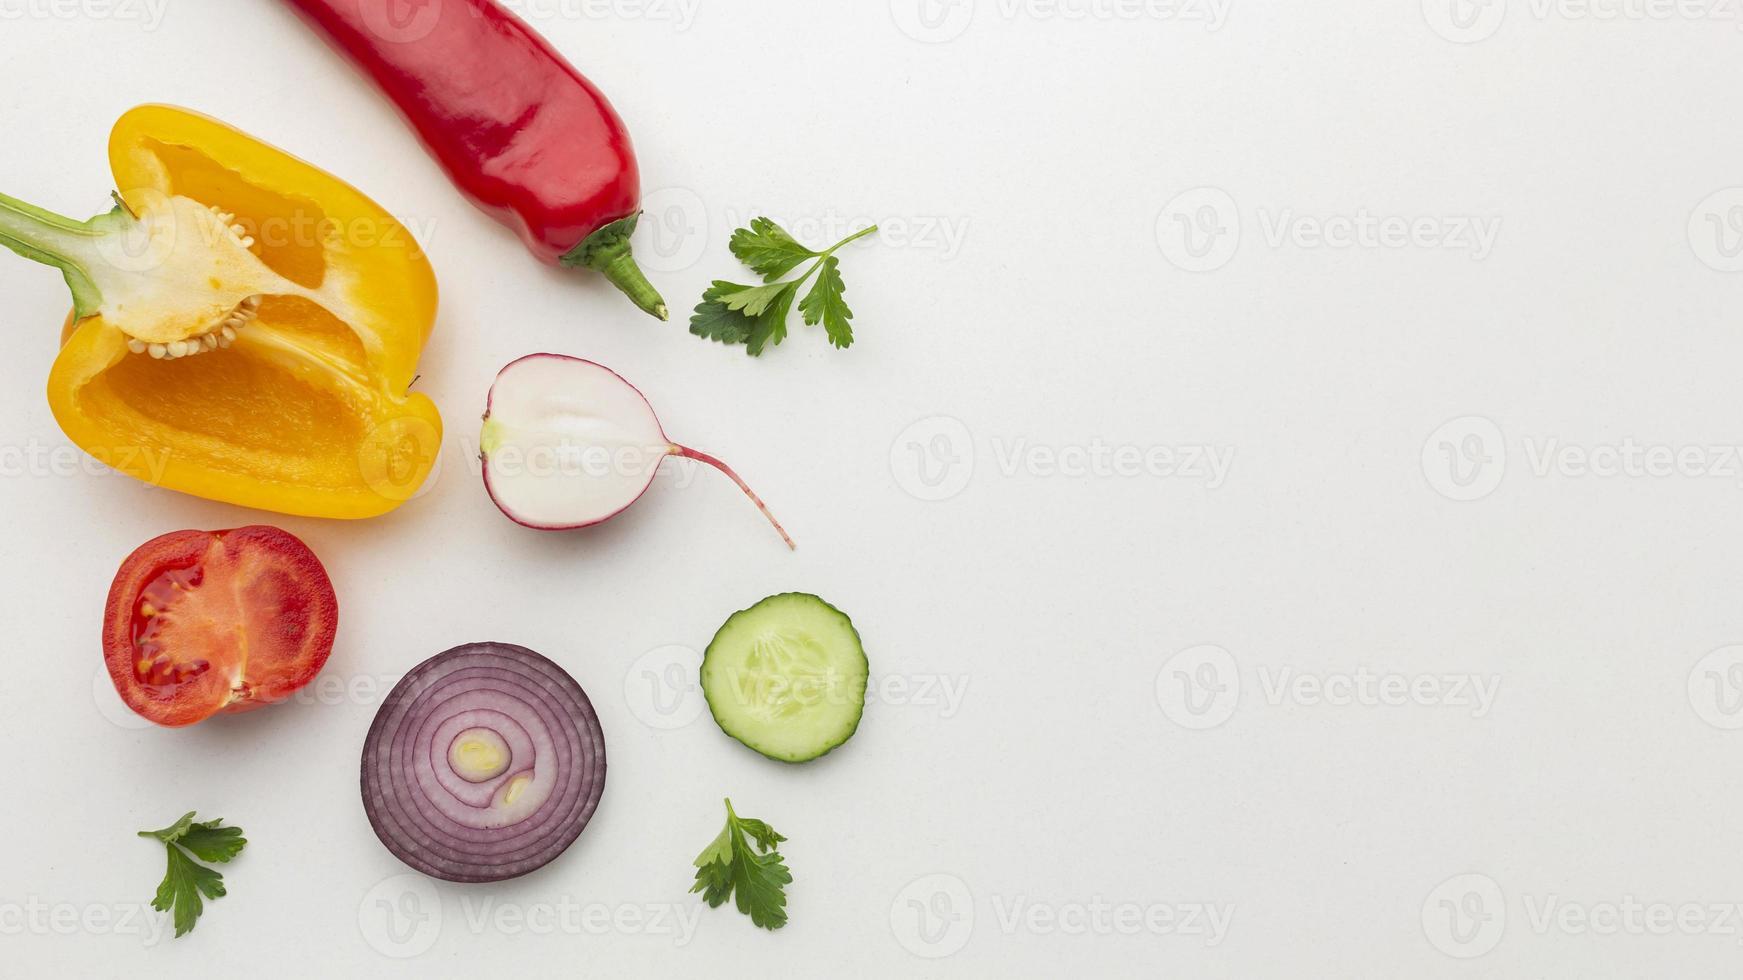 vue de dessus arrangement de légumes vue de dessus photo